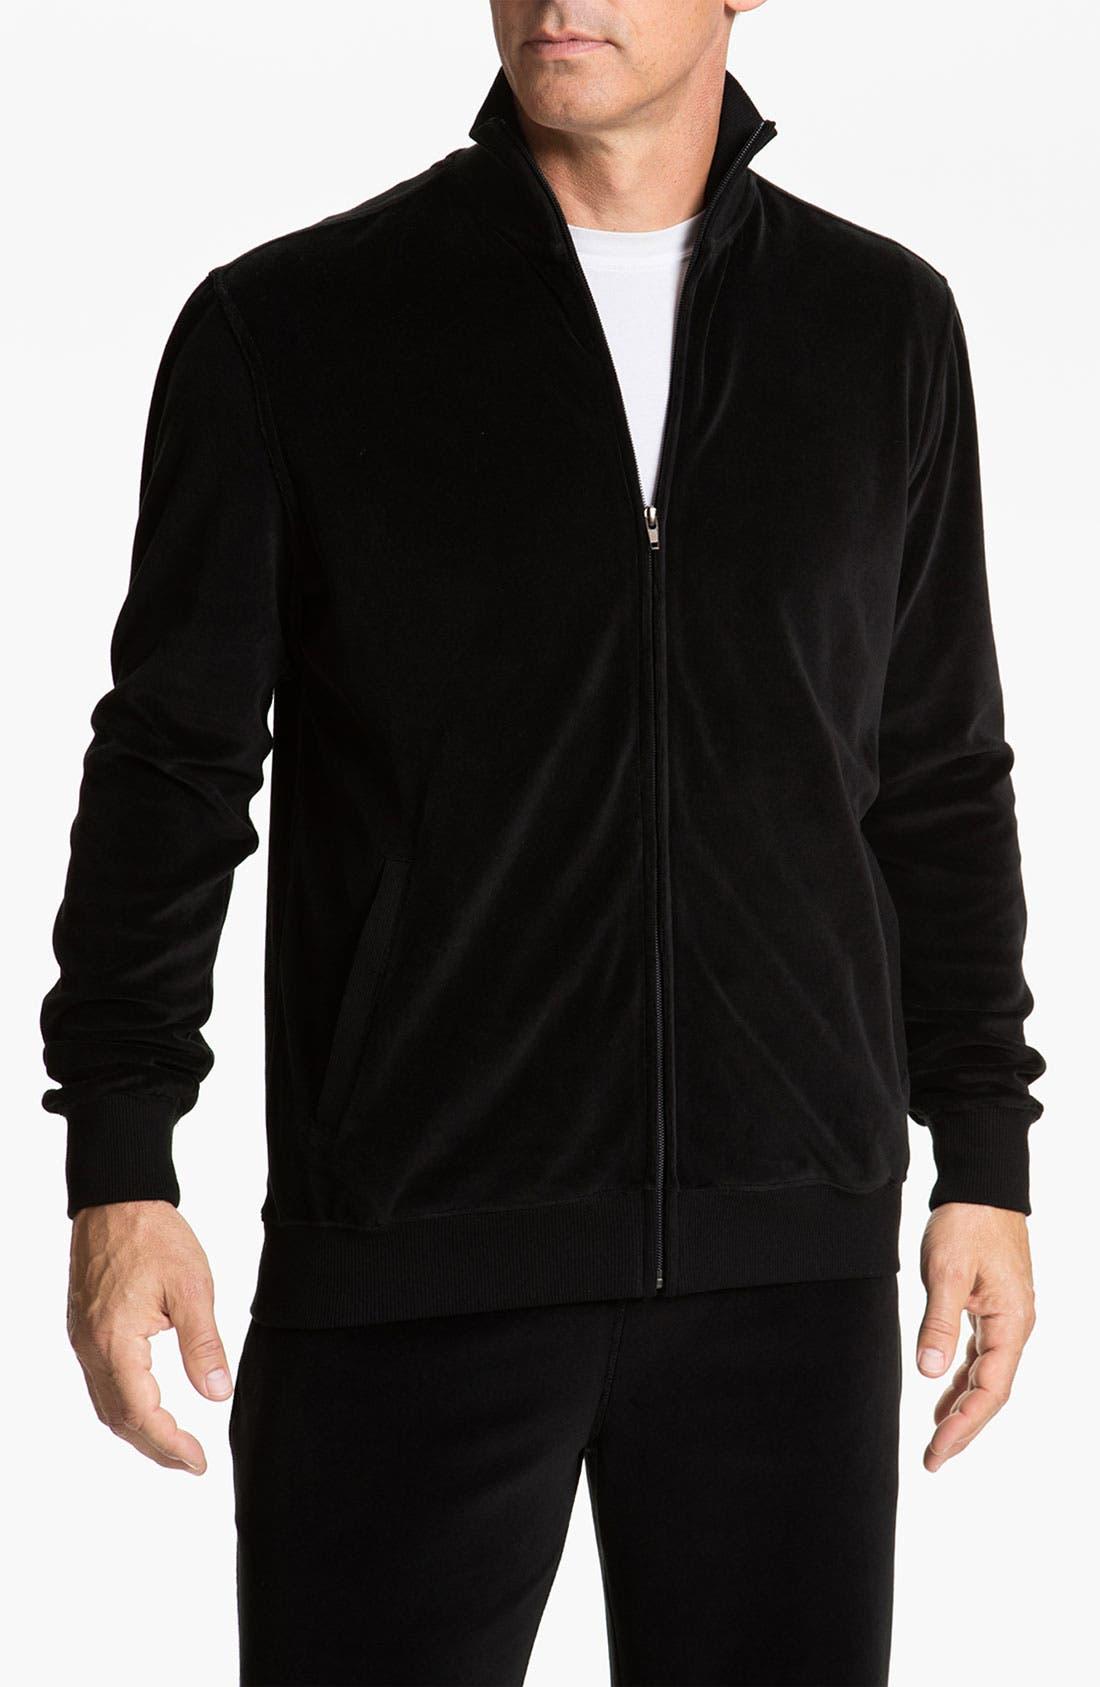 Alternate Image 1 Selected - Daniel Buchler 'Deluxe' Yarn-Dyed Velour Track Jacket